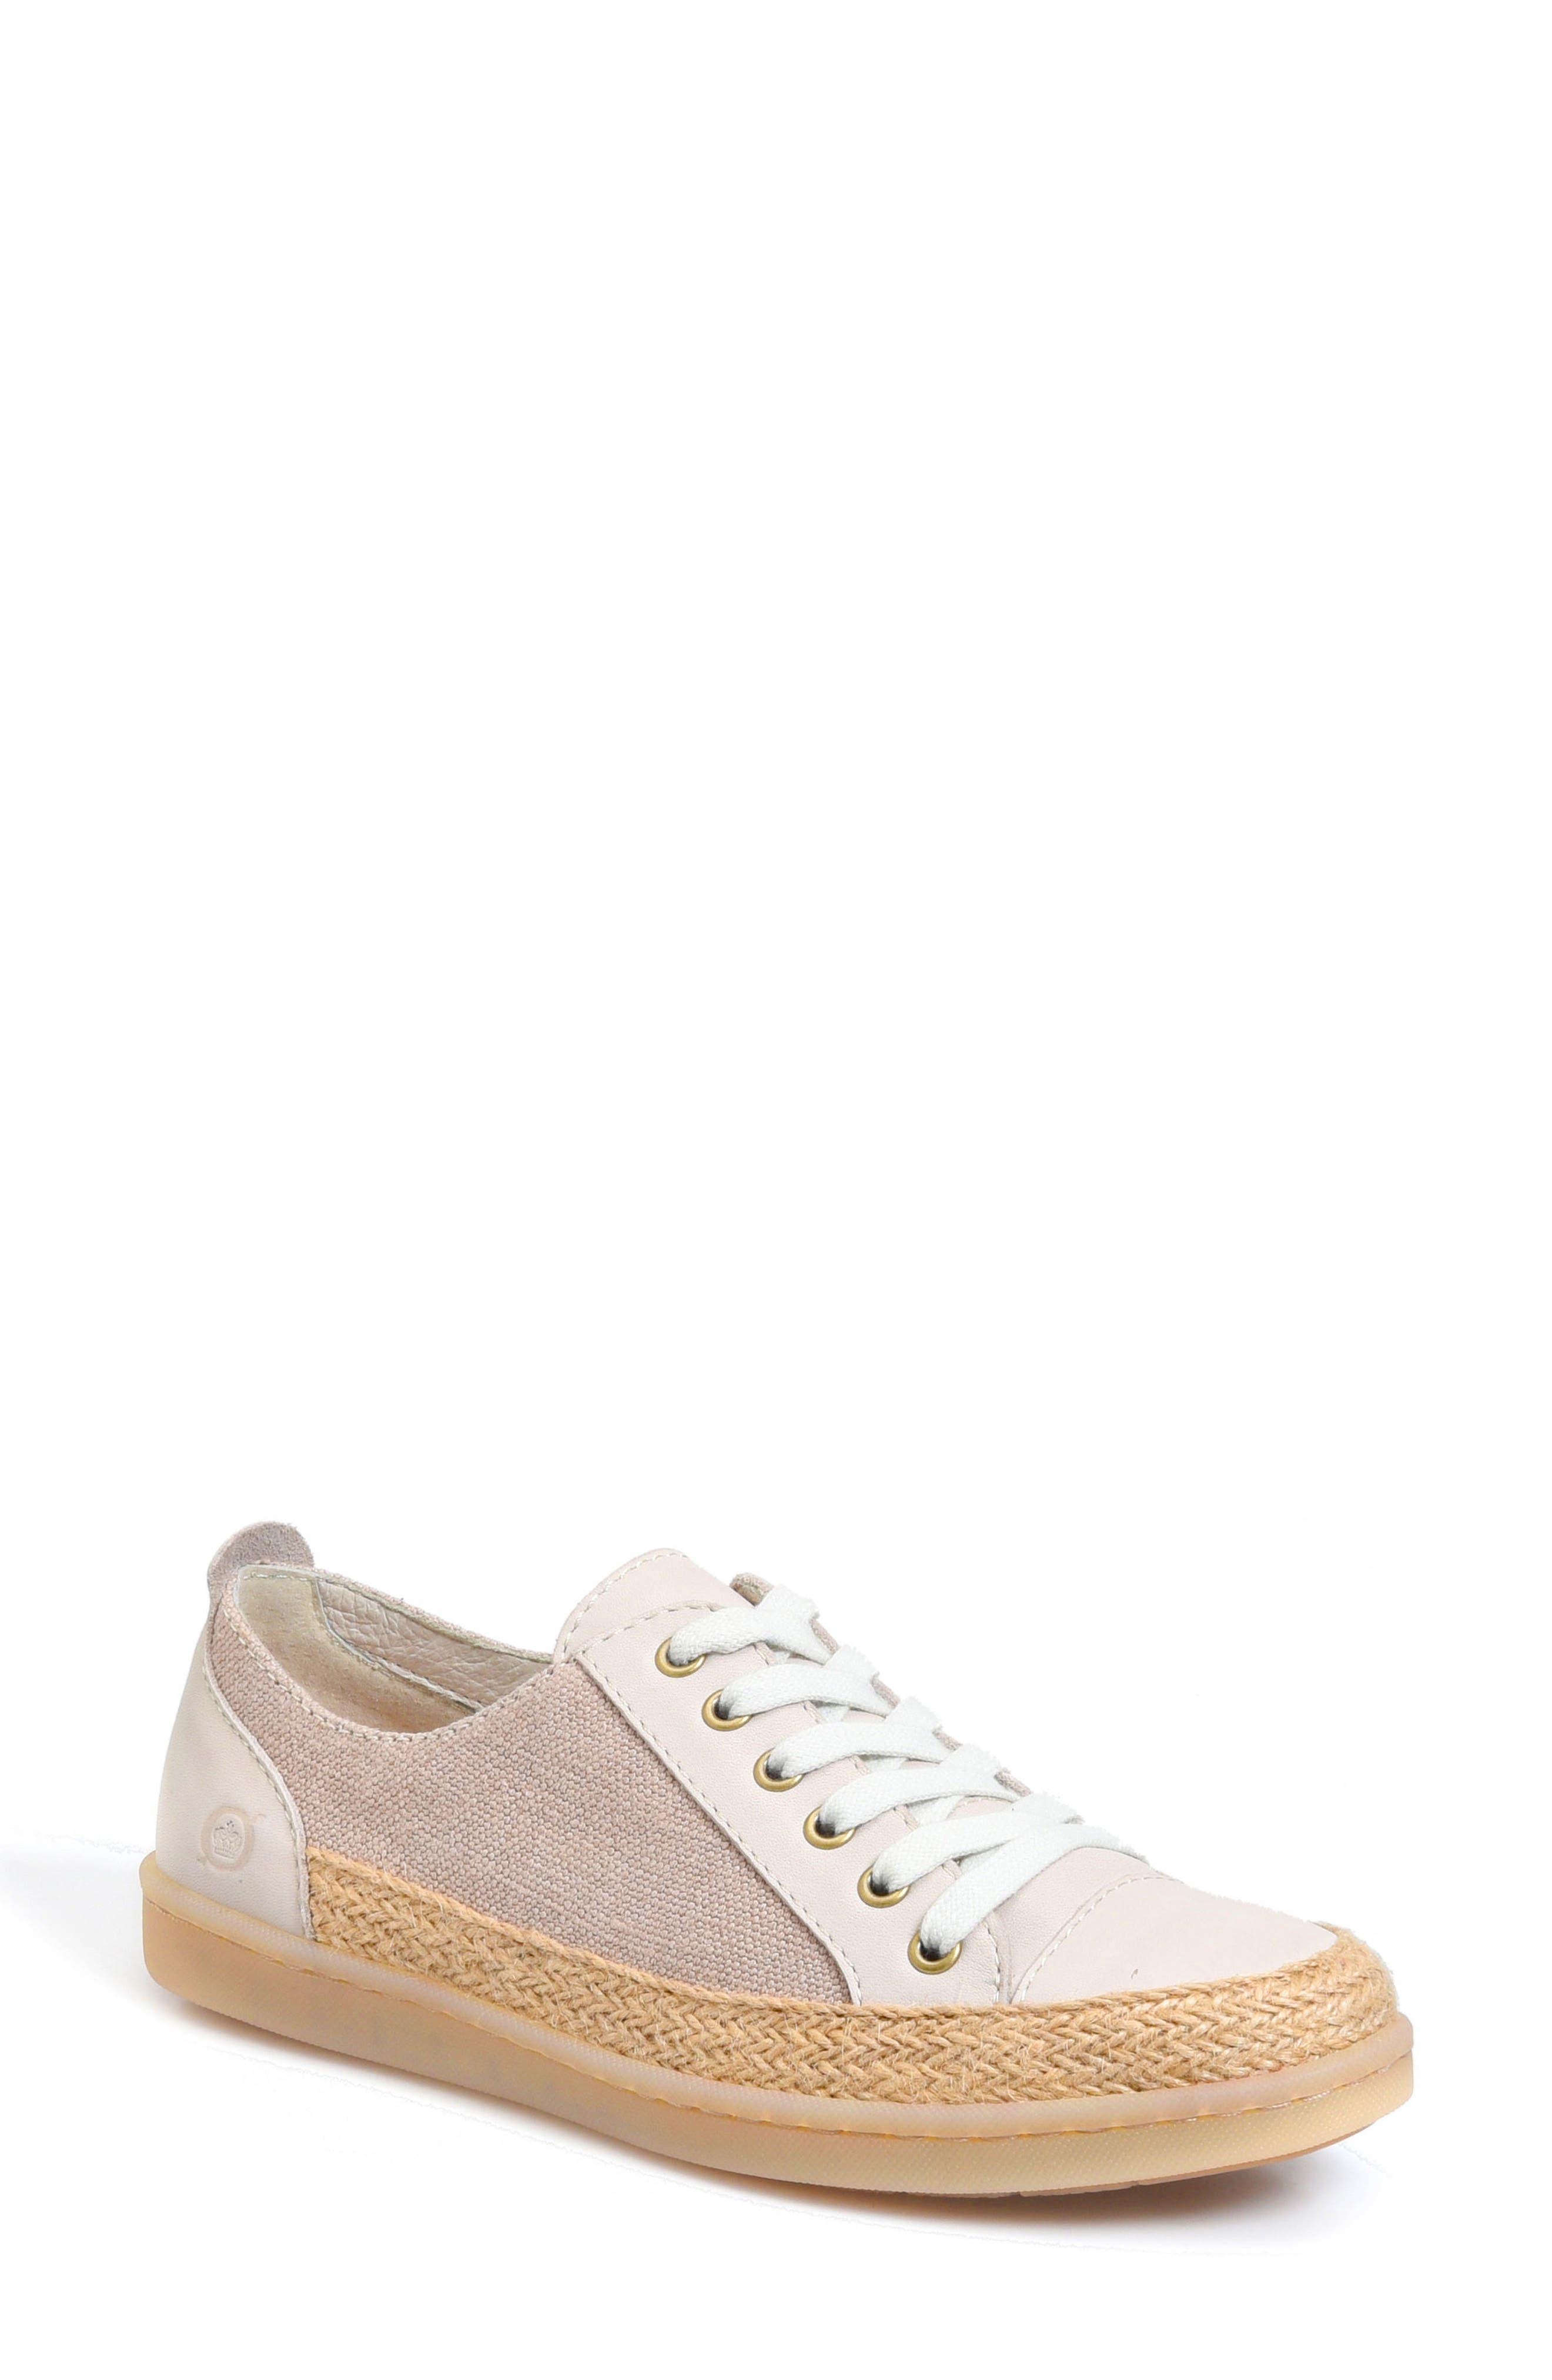 Corfield Sneaker,                         Main,                         color, 261